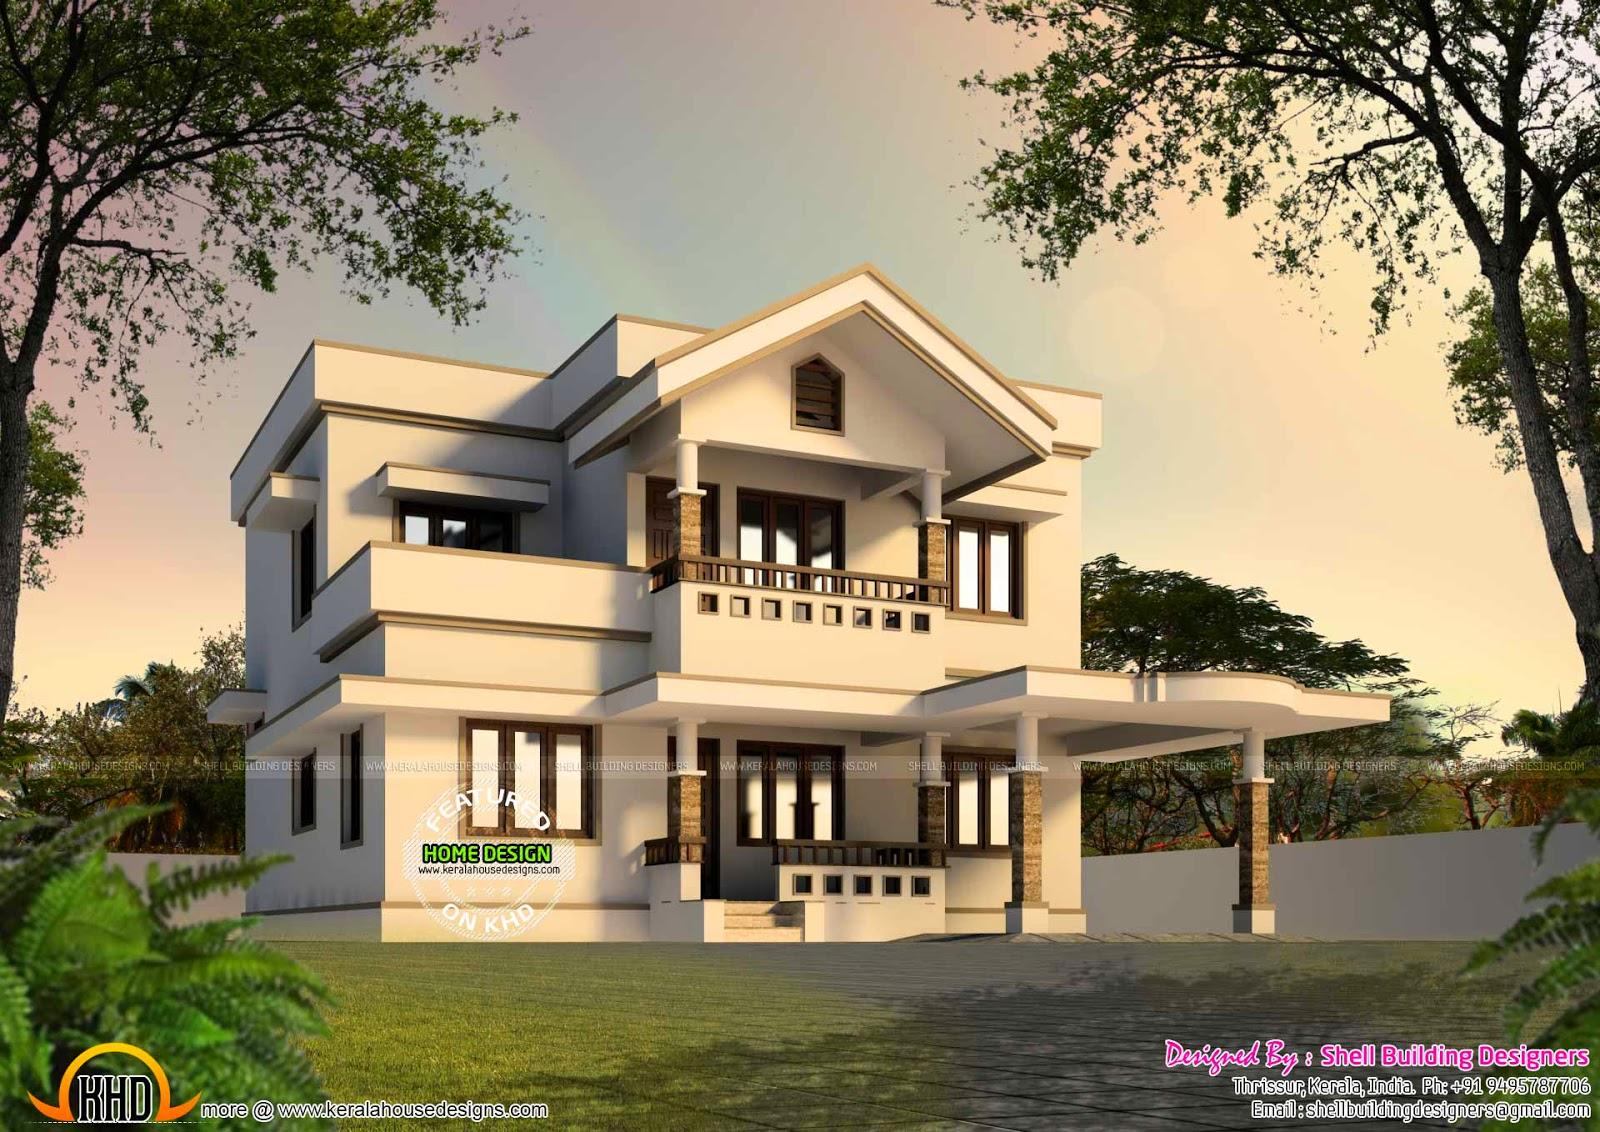 House Plan 2000 Sq Ft | Nabelea.com